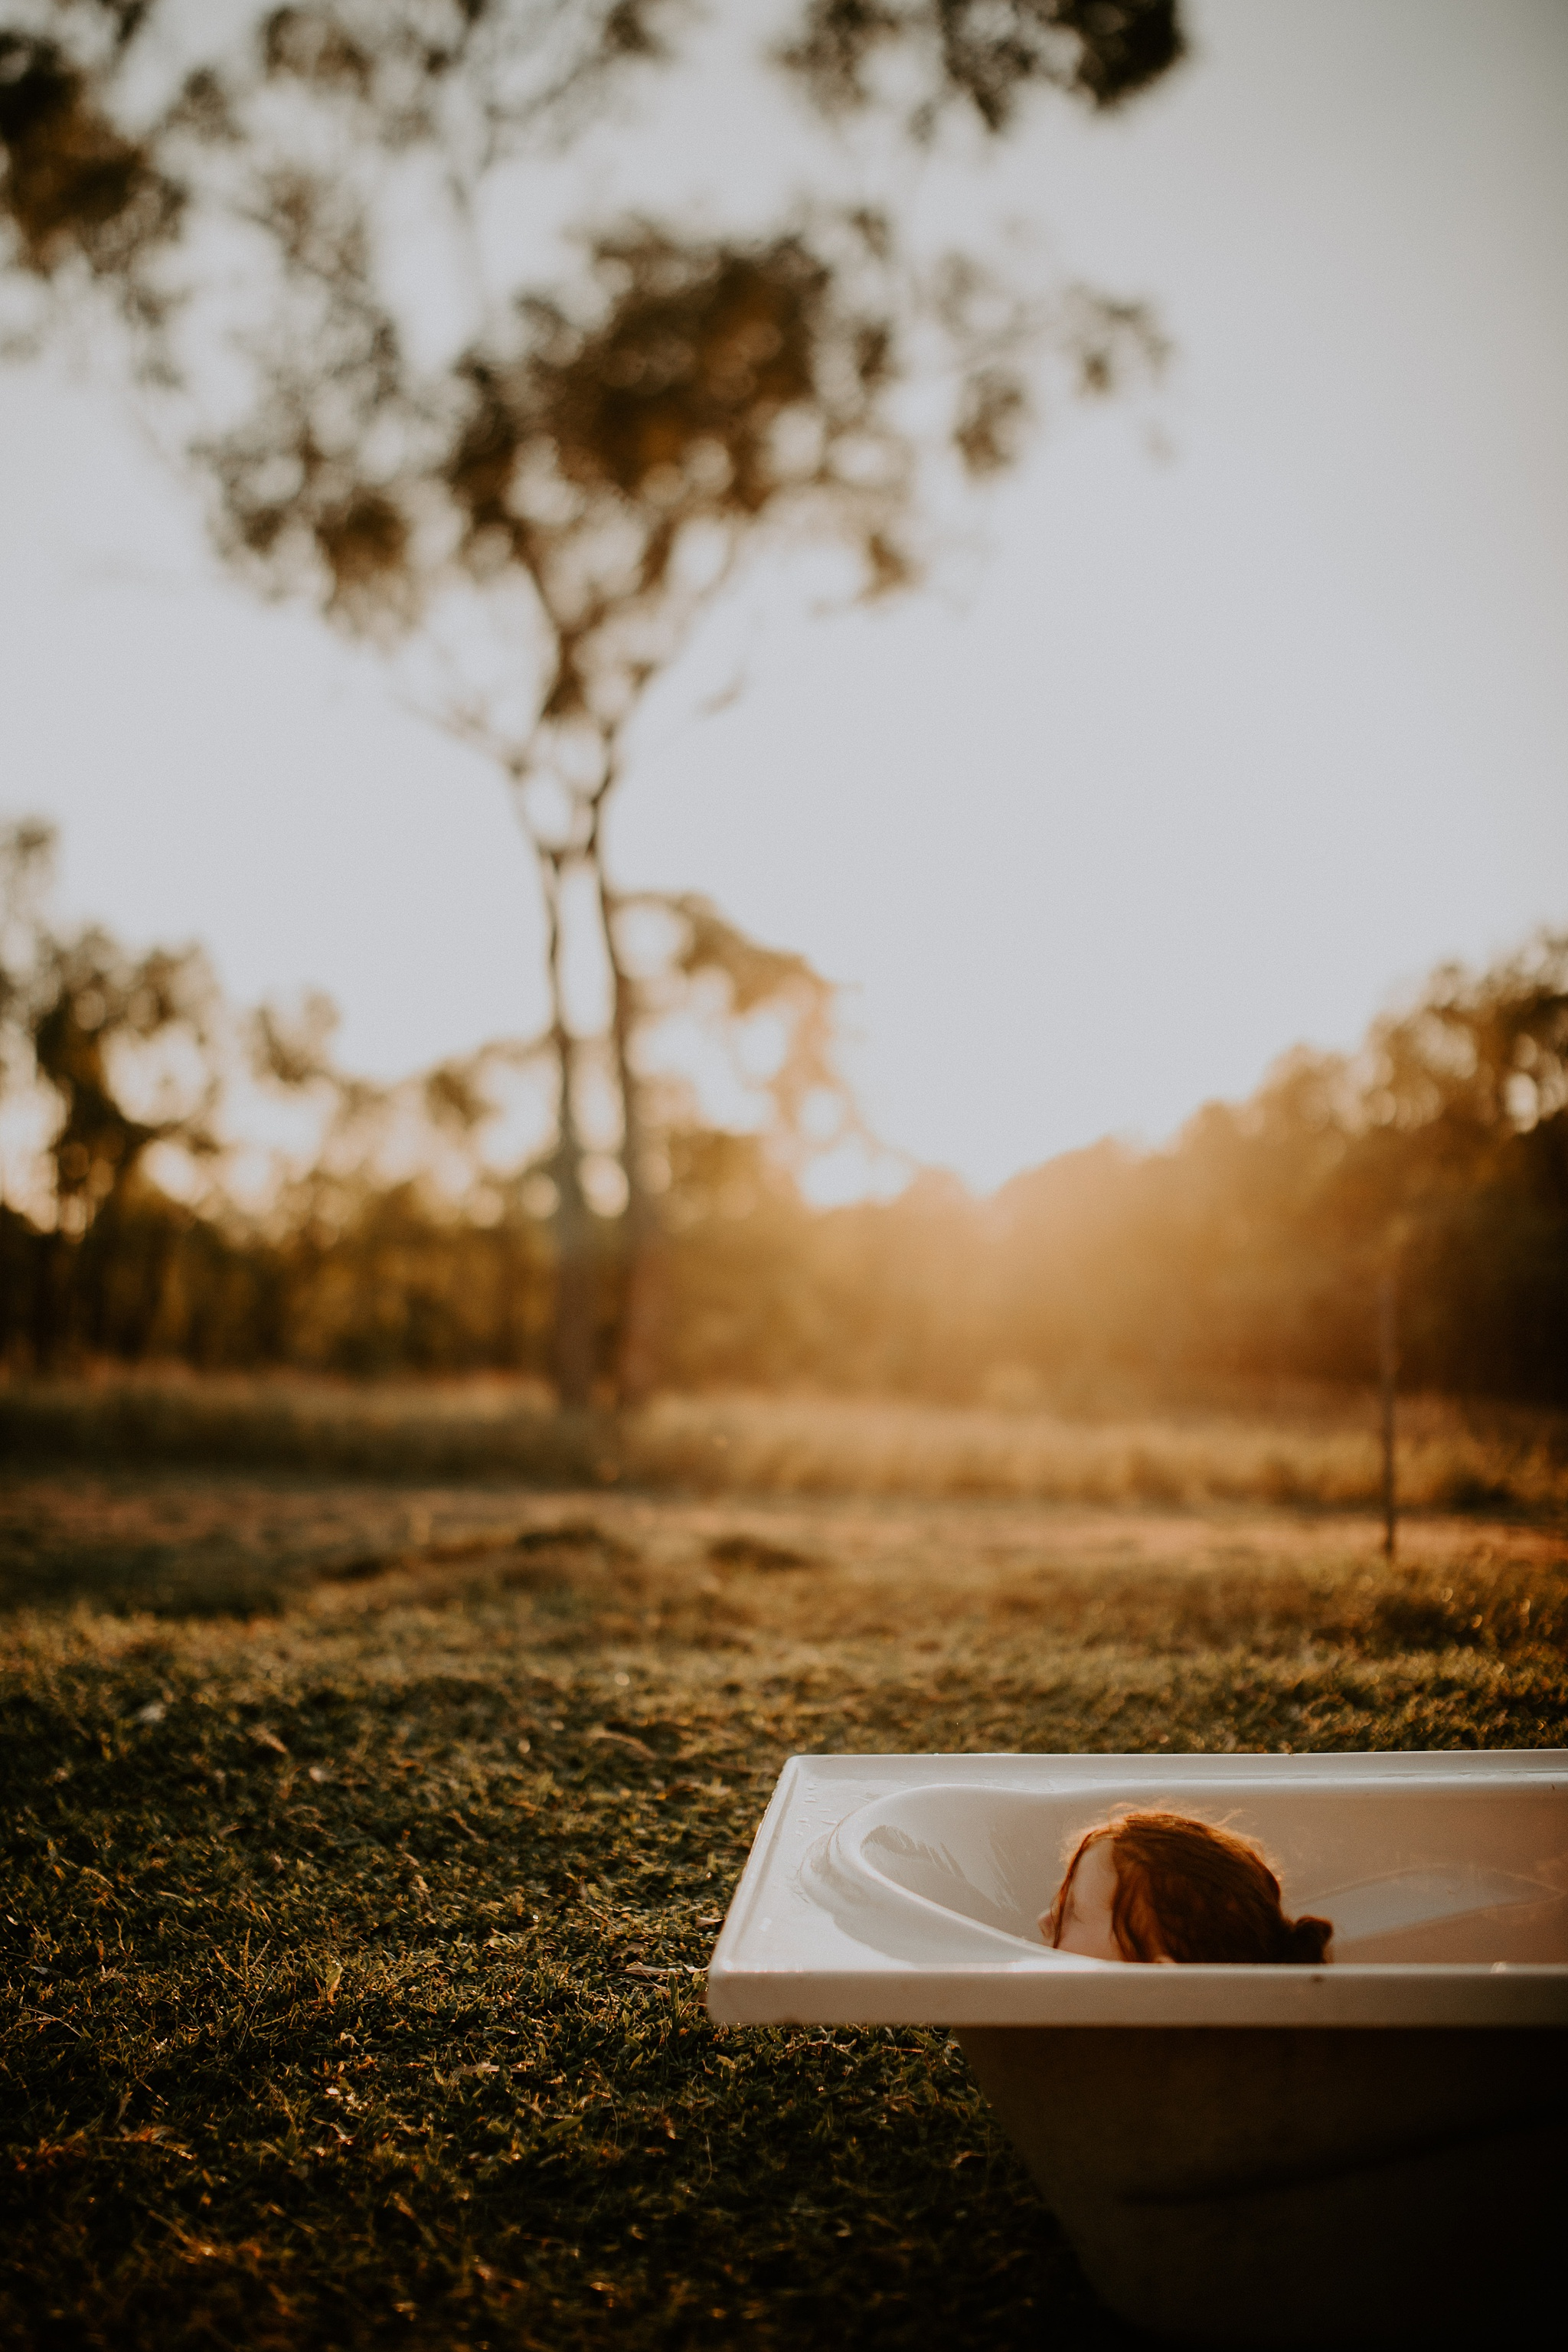 Camilla-French-Townsville-Cairns-Mission-Beach-Port-Douglas-Queensland-family-lifestyle-wedding-eleopment-photographer_0070.jpg